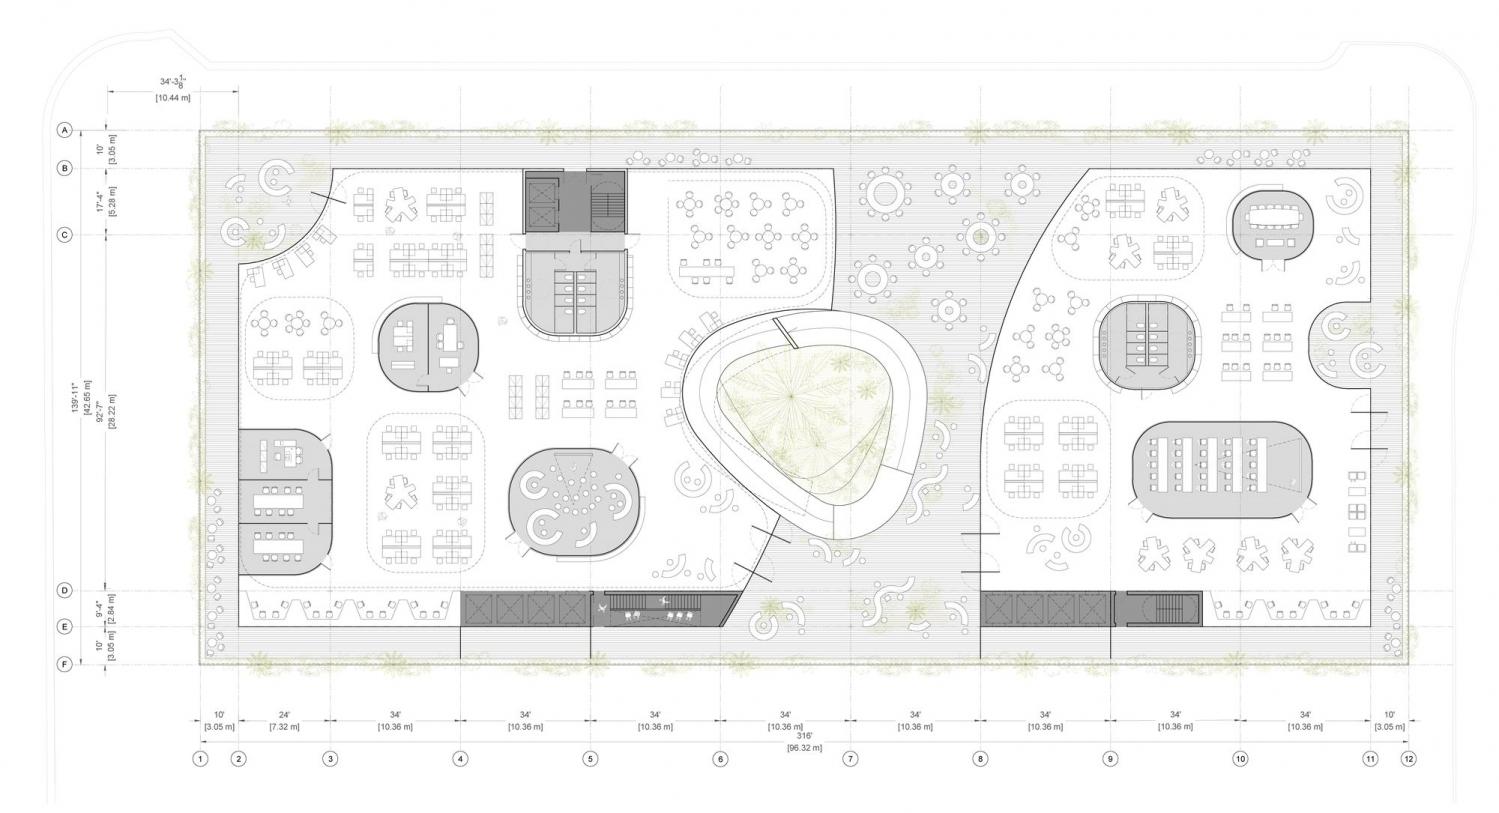 Ecosistema-Urbano-.-Banyan-Hub-.-West-Palm-Beach-afasia-14.jpg